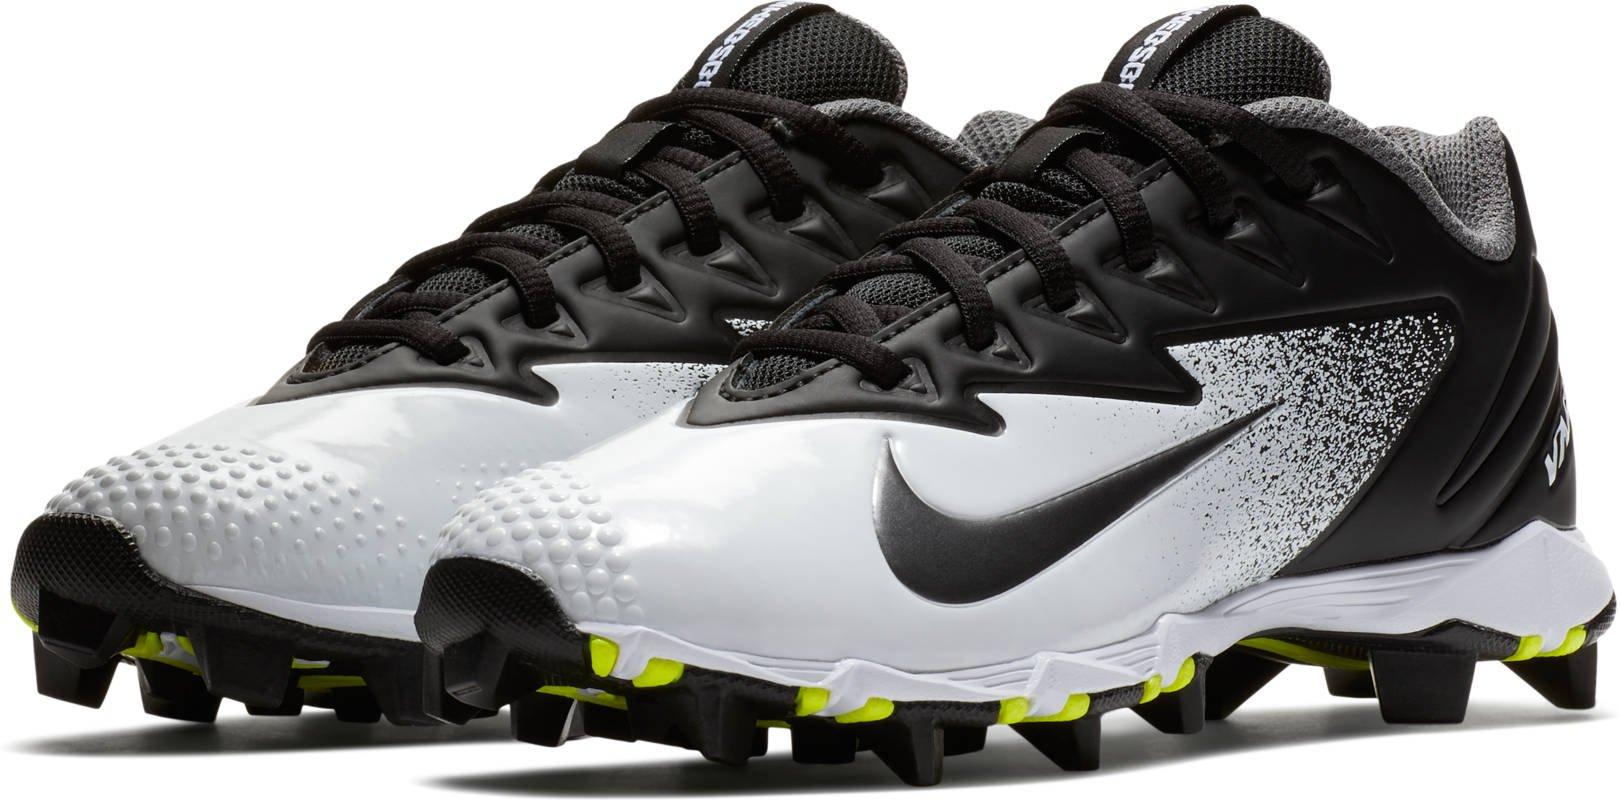 Nike Boy's Vapor Ultrafly Keystone BG Baseball Cleats (4 Big Kid M, Black/Metallic Silver/White)